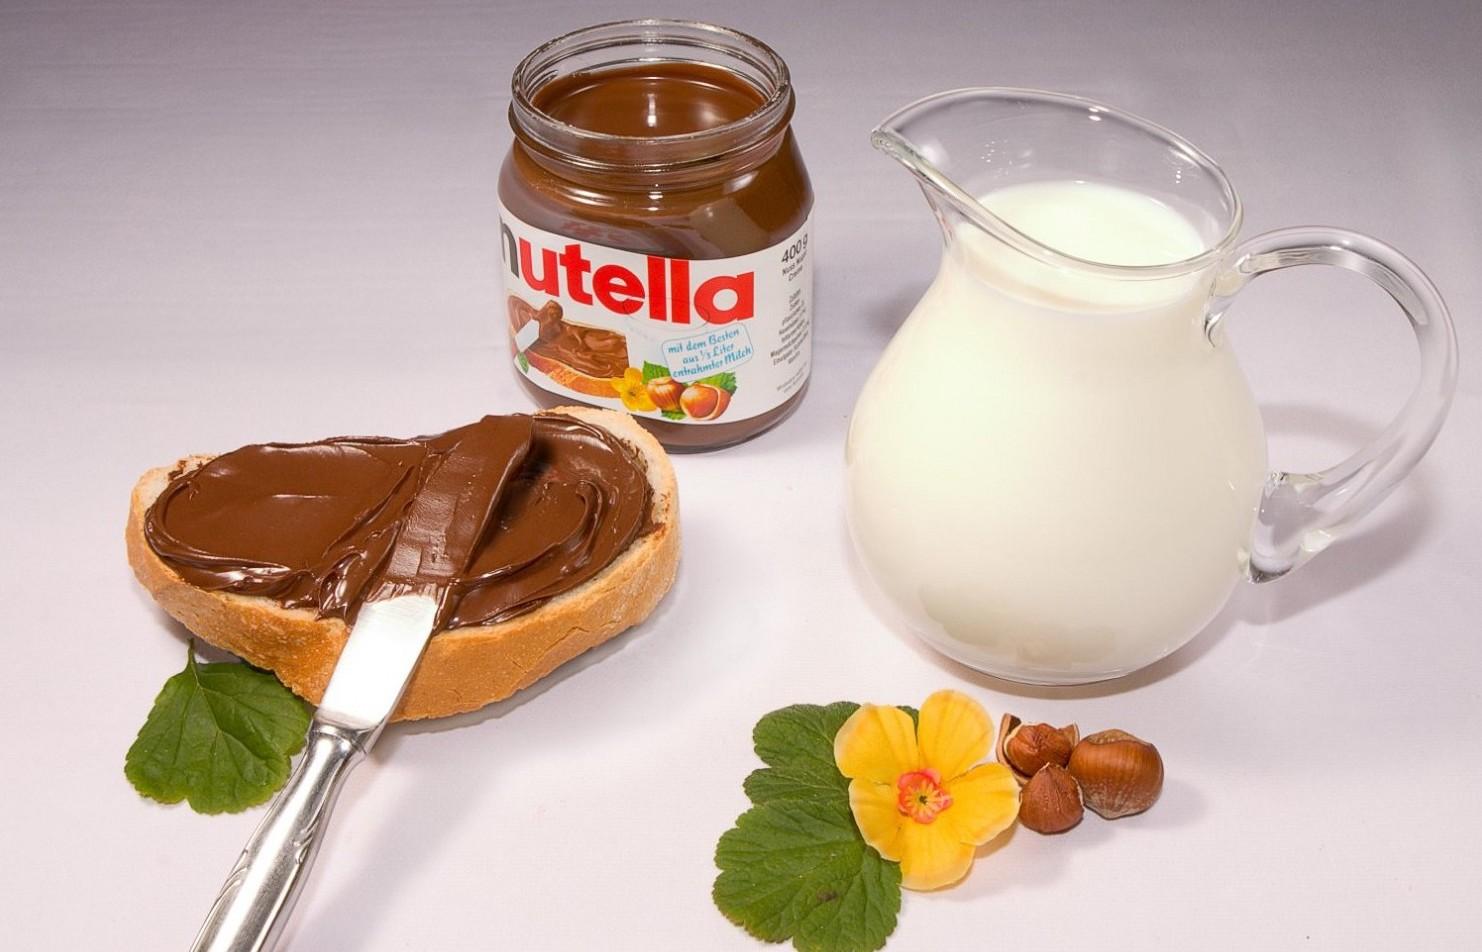 Ferrero ricerca 90 assaggiatori di Nutel